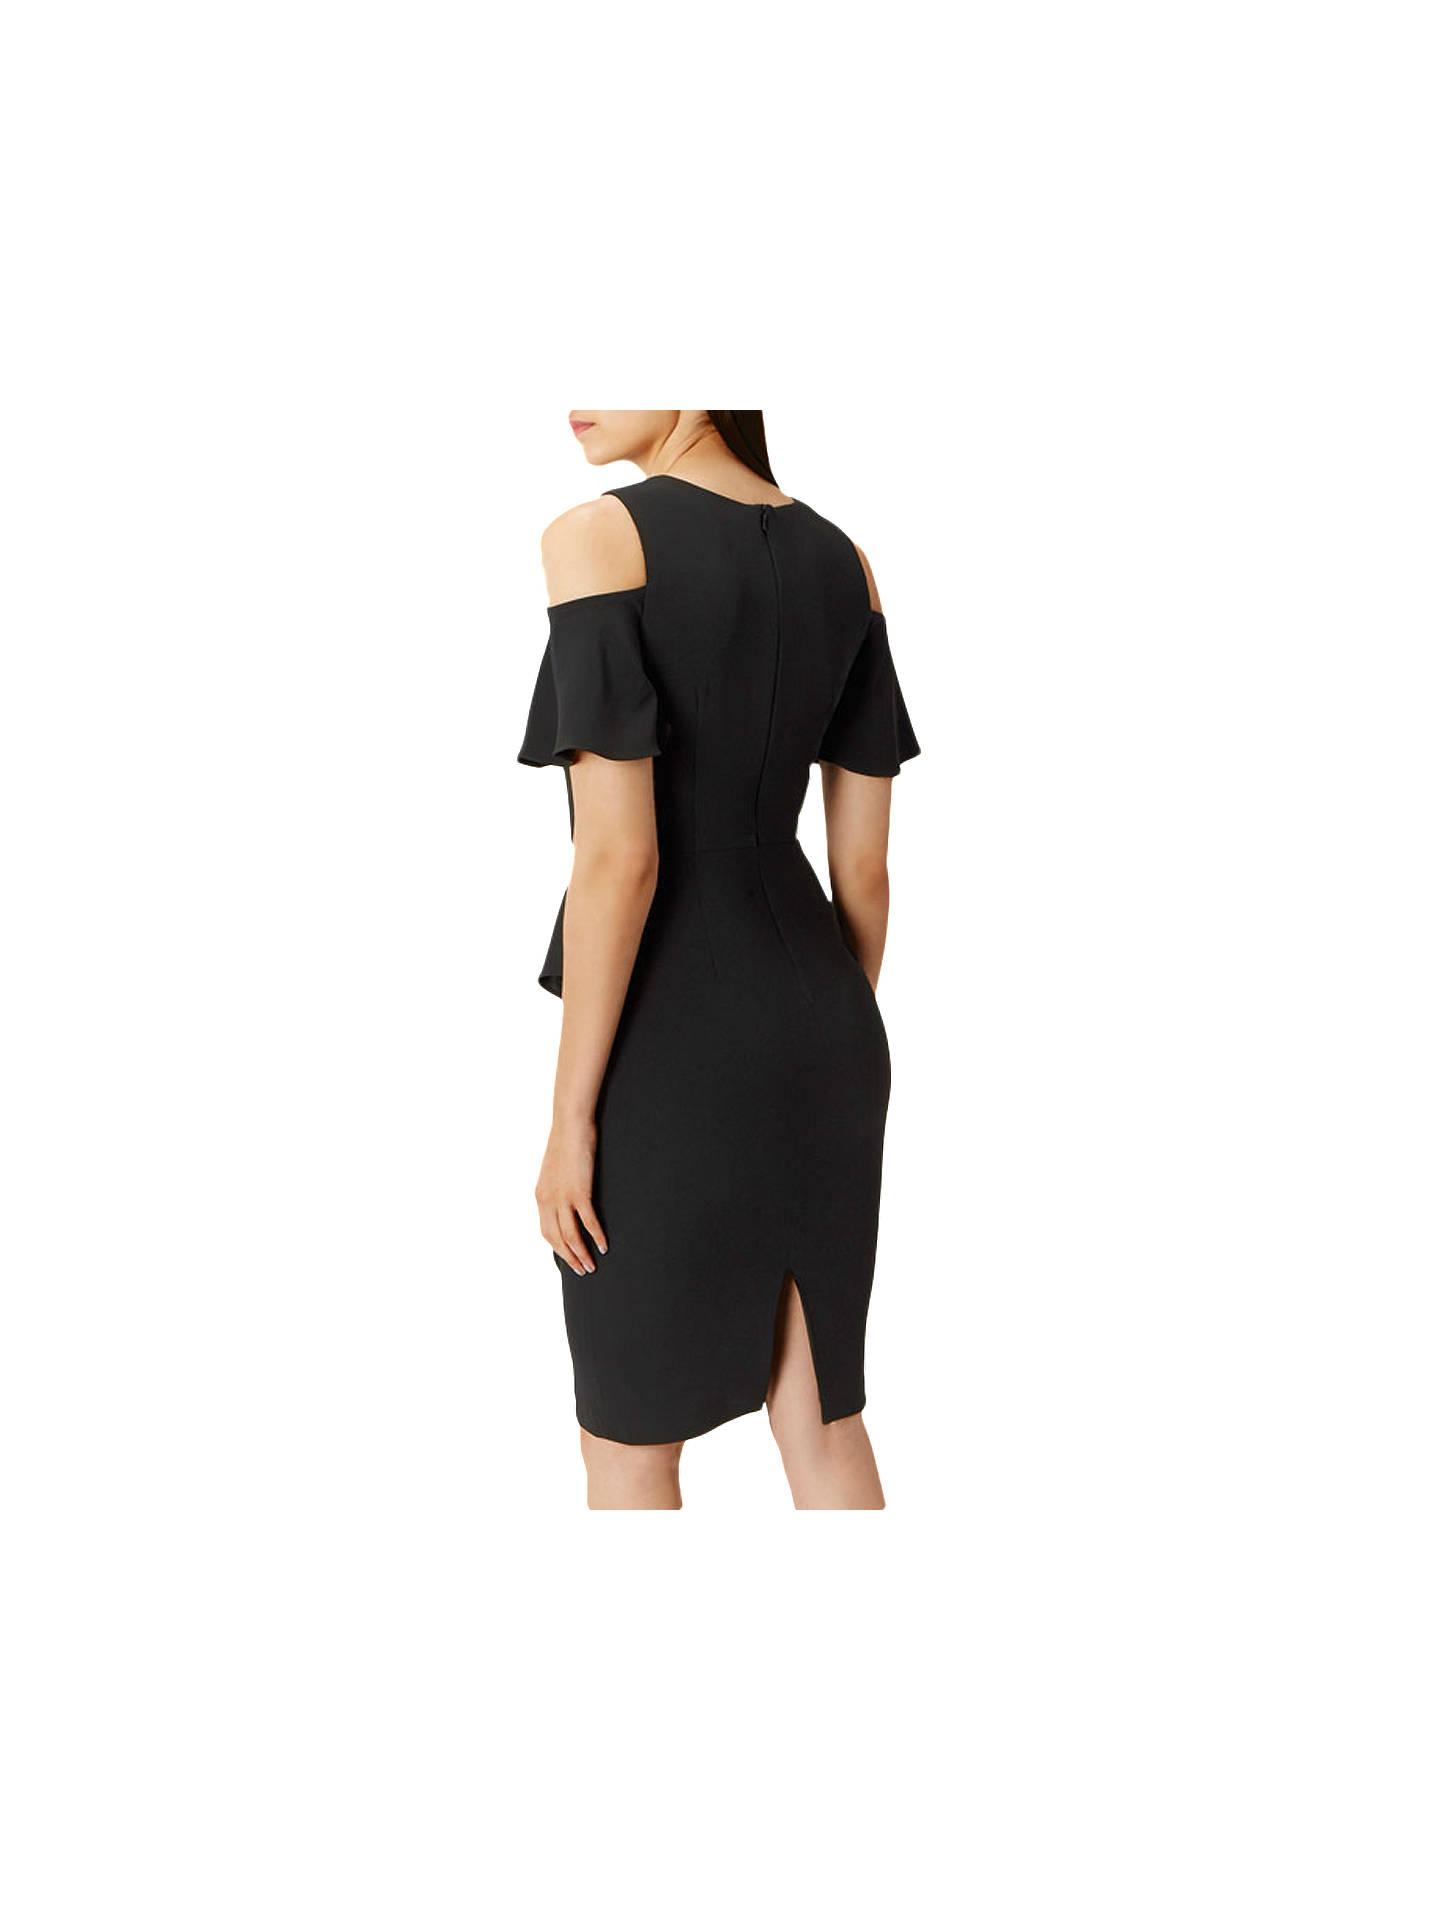 385f7472118c ... Buy Coast Lendra Crepe Dress, Black, 6 Online at johnlewis.com ...